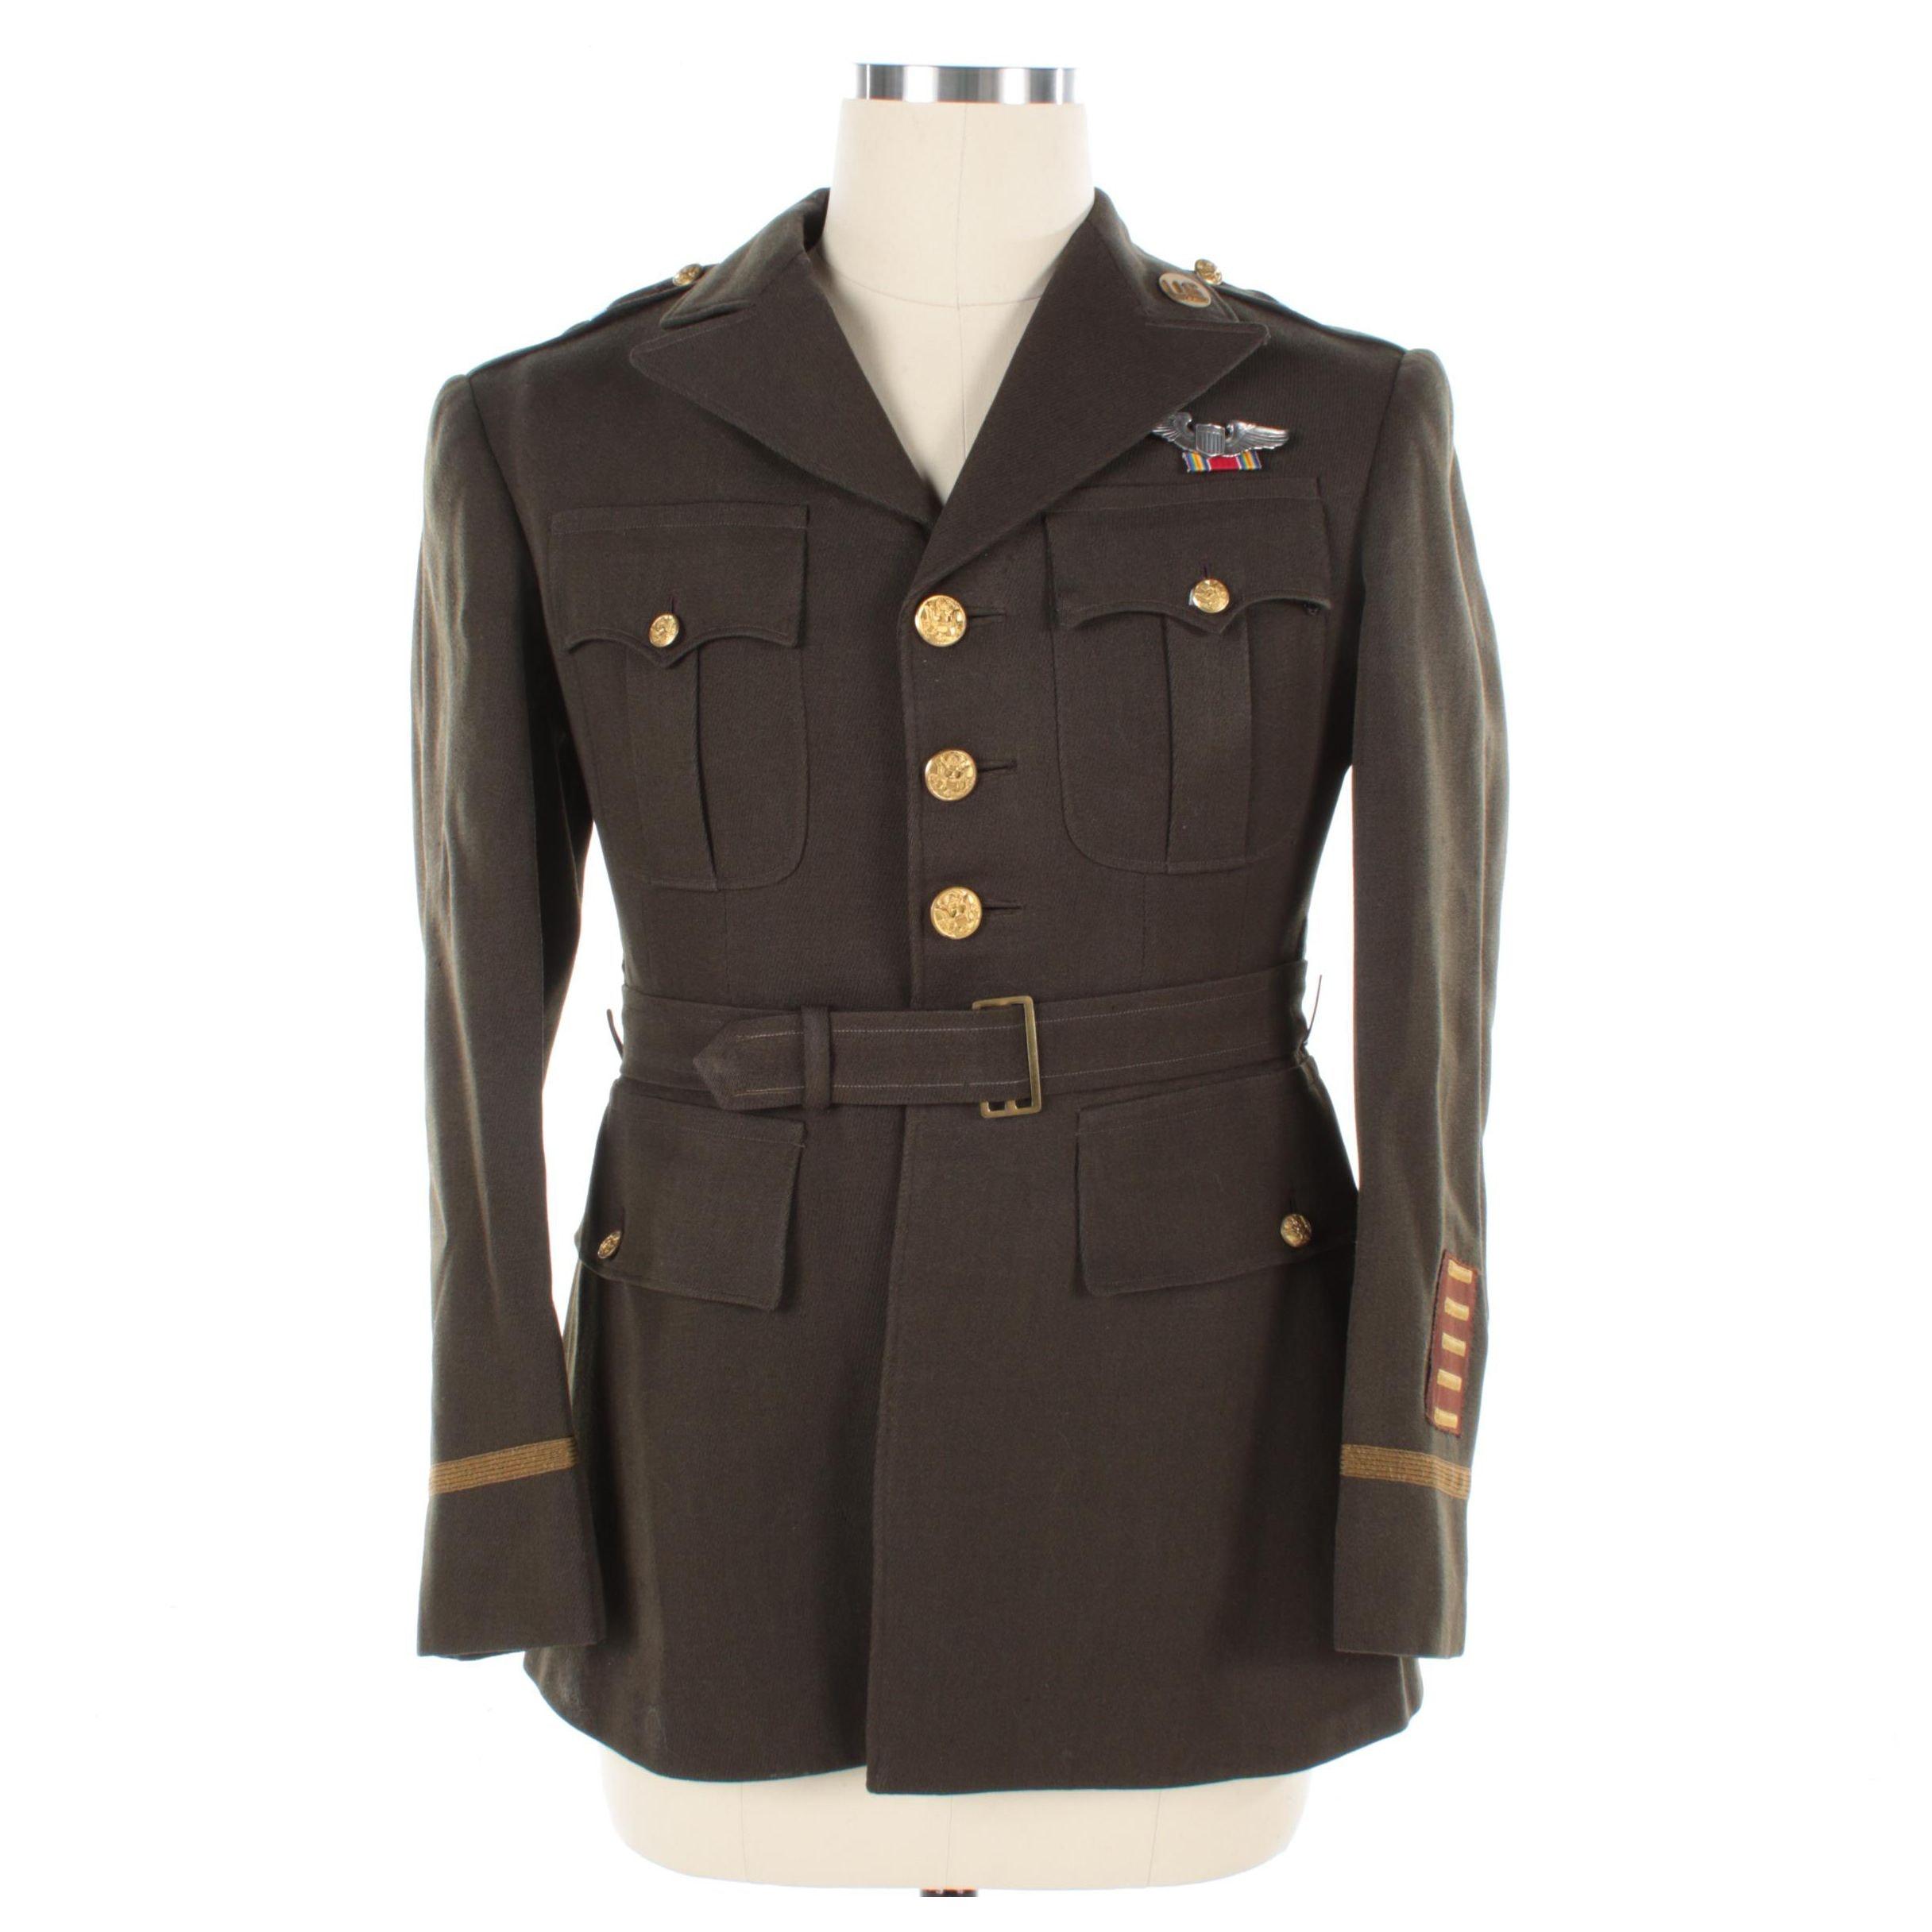 World War II US Army Air Force Officer's Winter Service Uniform Jacket